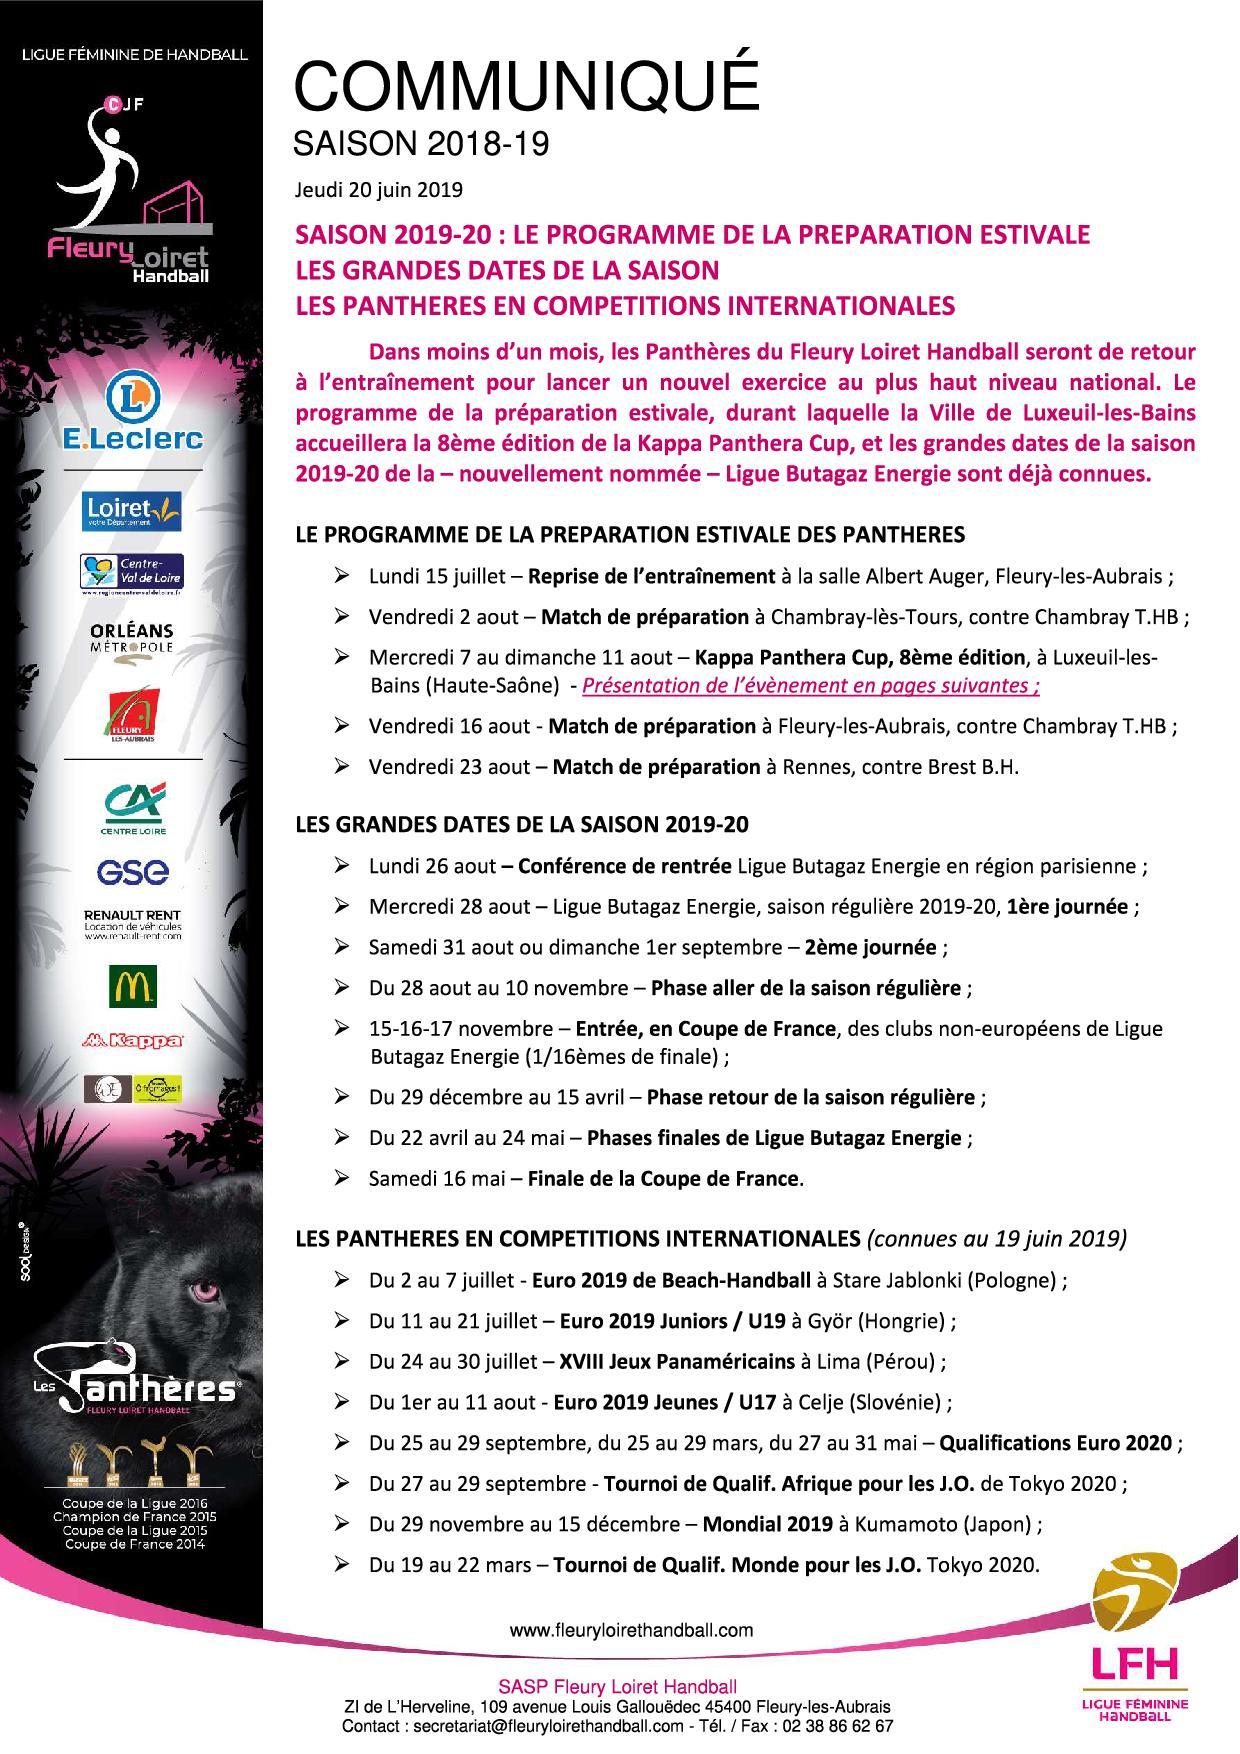 Communiqué Fleury Loiret Handball - Jeudi 20 juin 2019 - Communiqué Fleury Loiret Handball - Jeudi 20 juin 20191.jpg